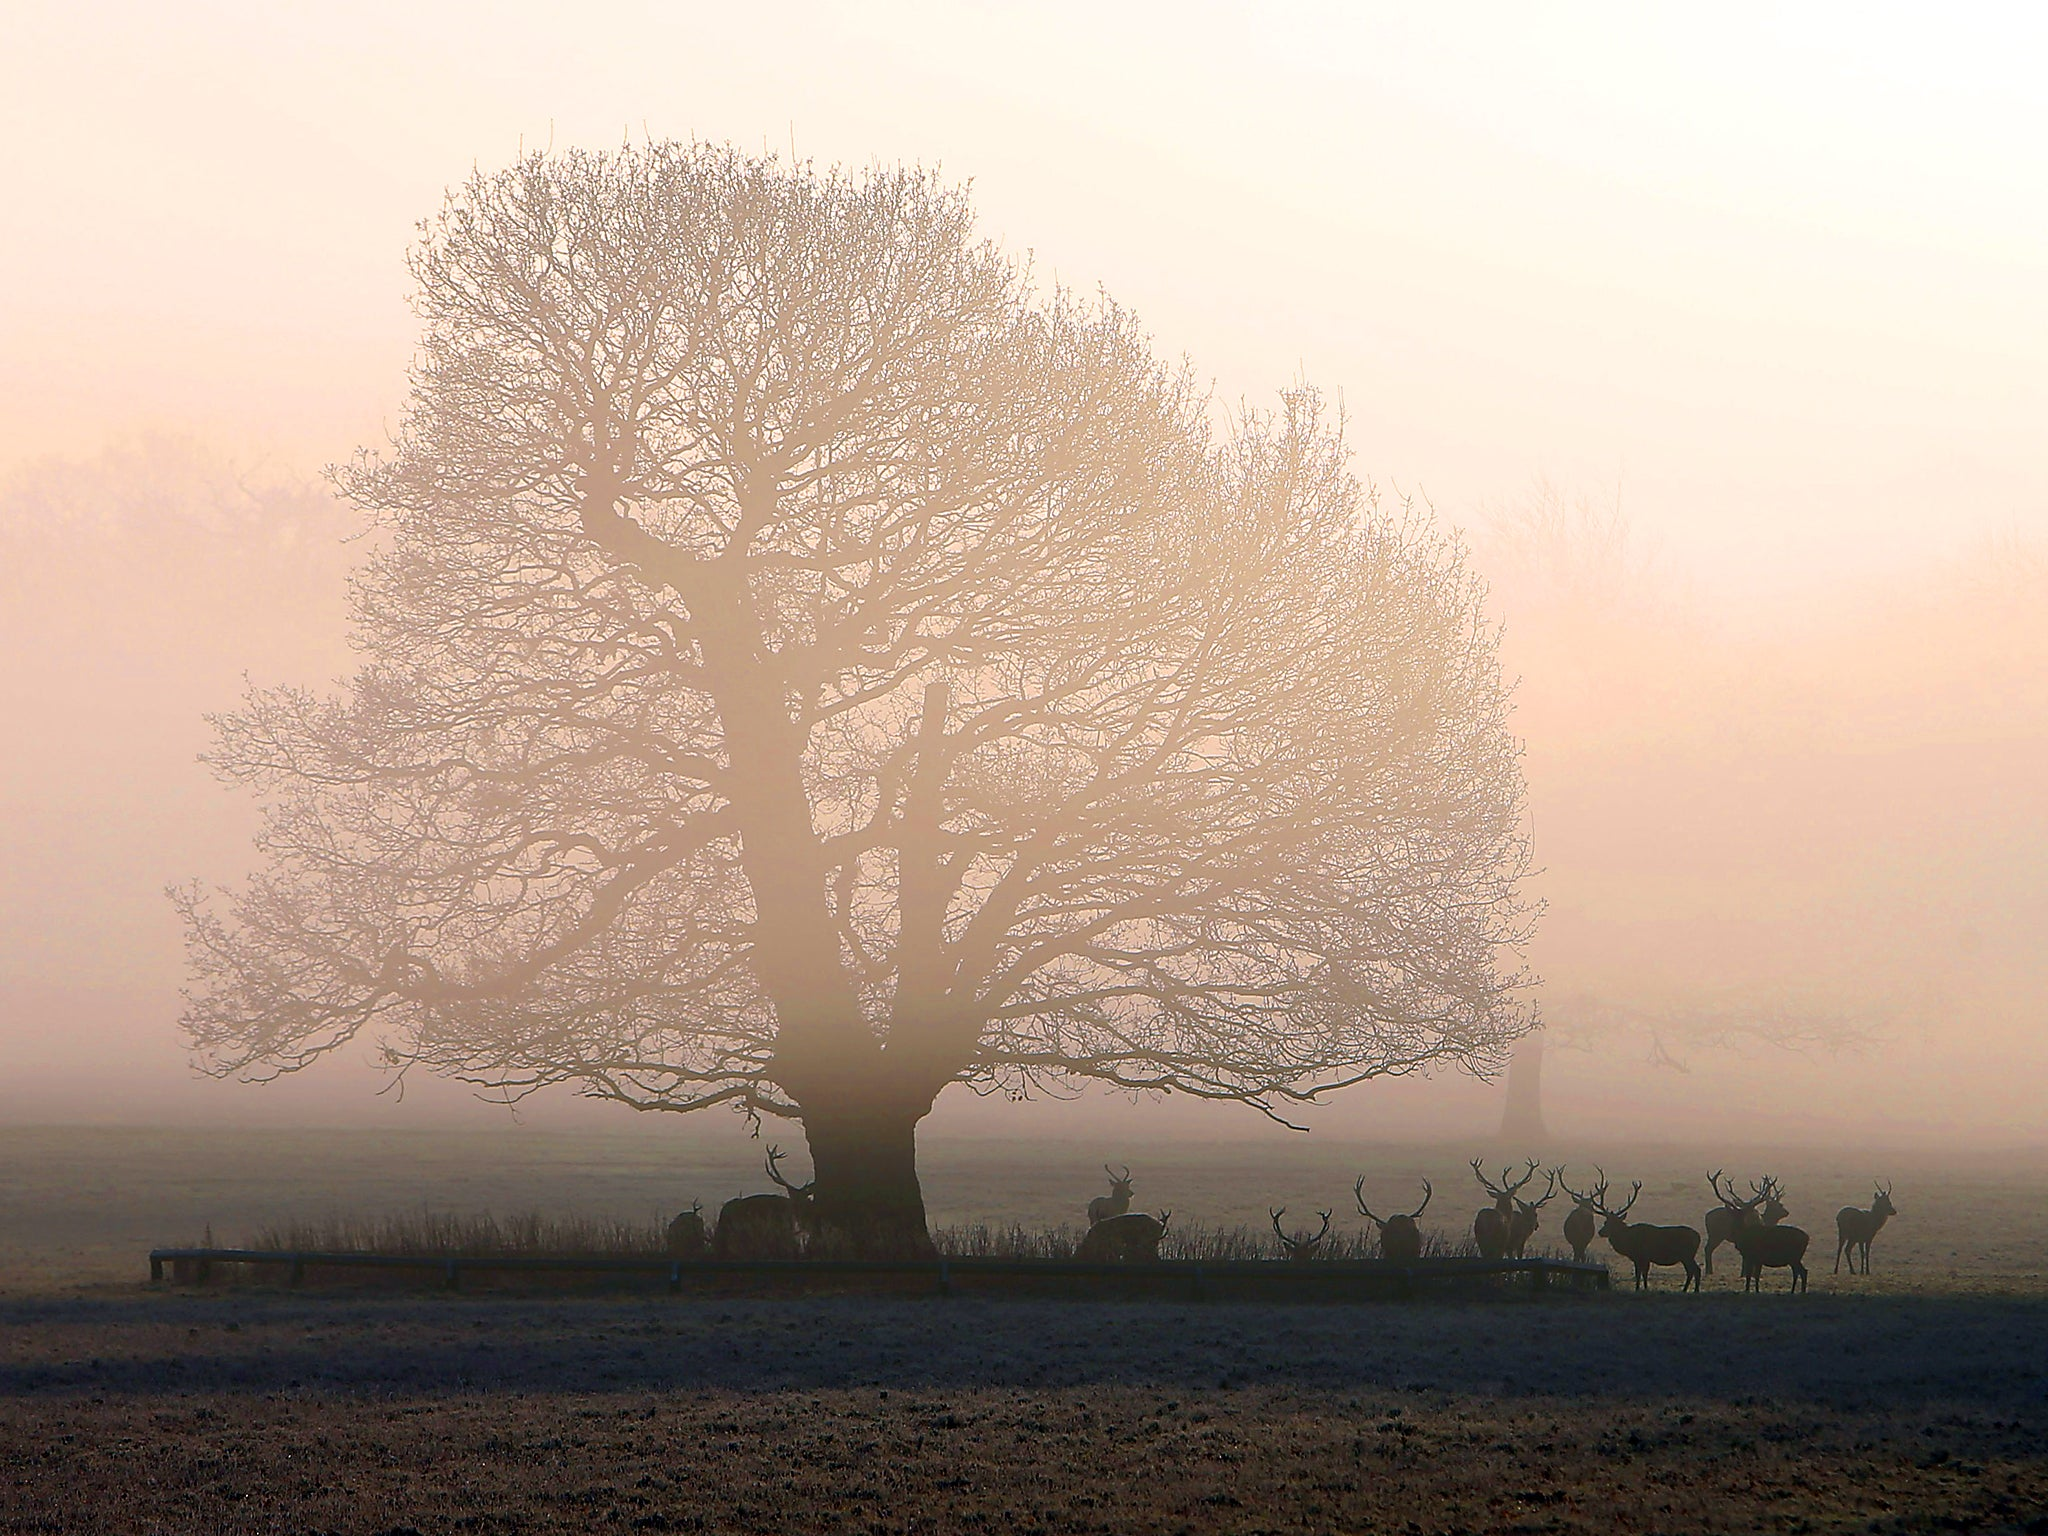 UK weather latest: Temperatures to fall below zero as Britain faces 'polar vortex'